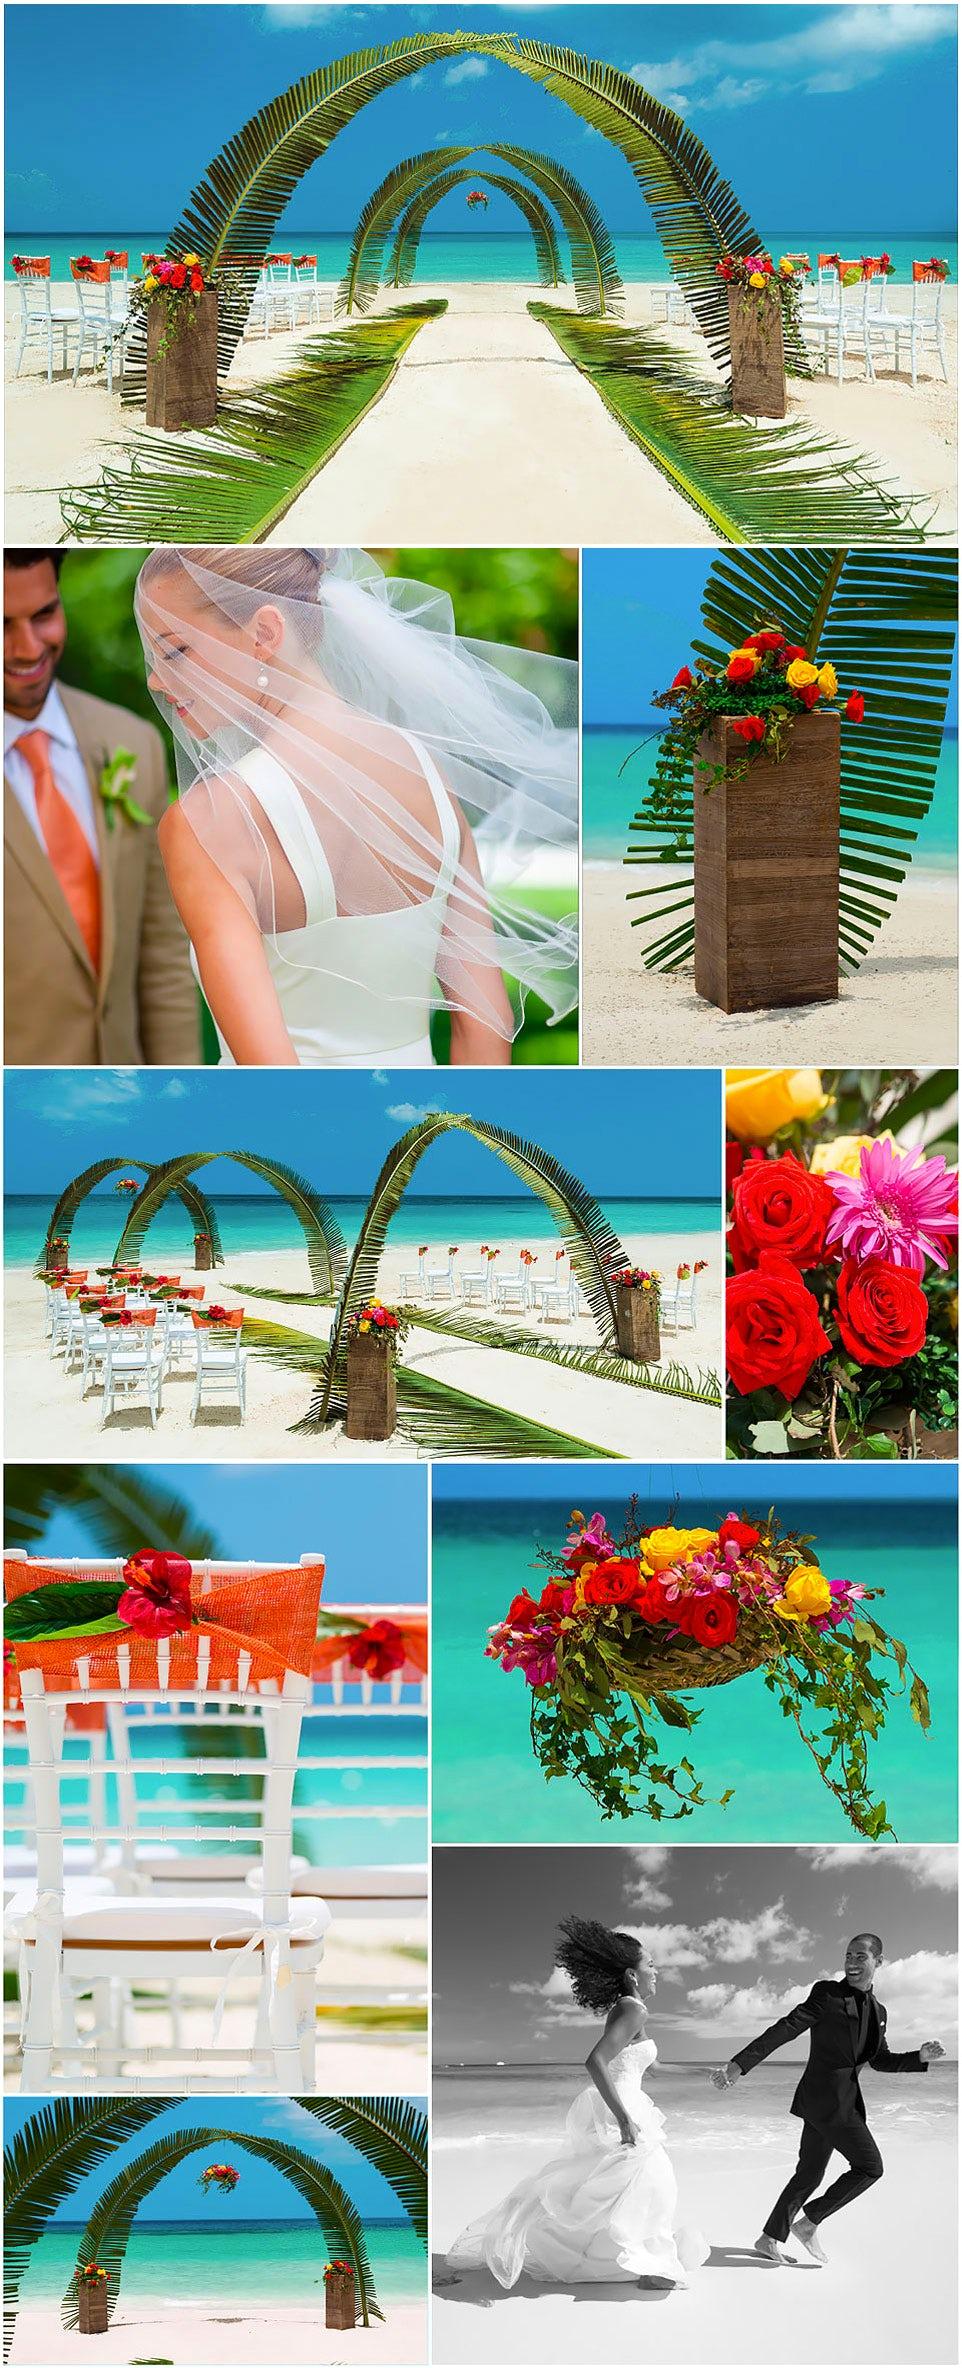 Sandals Sandals Resortamp; Lasource Lasource Resortamp; Spa Grenada Spa Grenada xBoWrdQCe